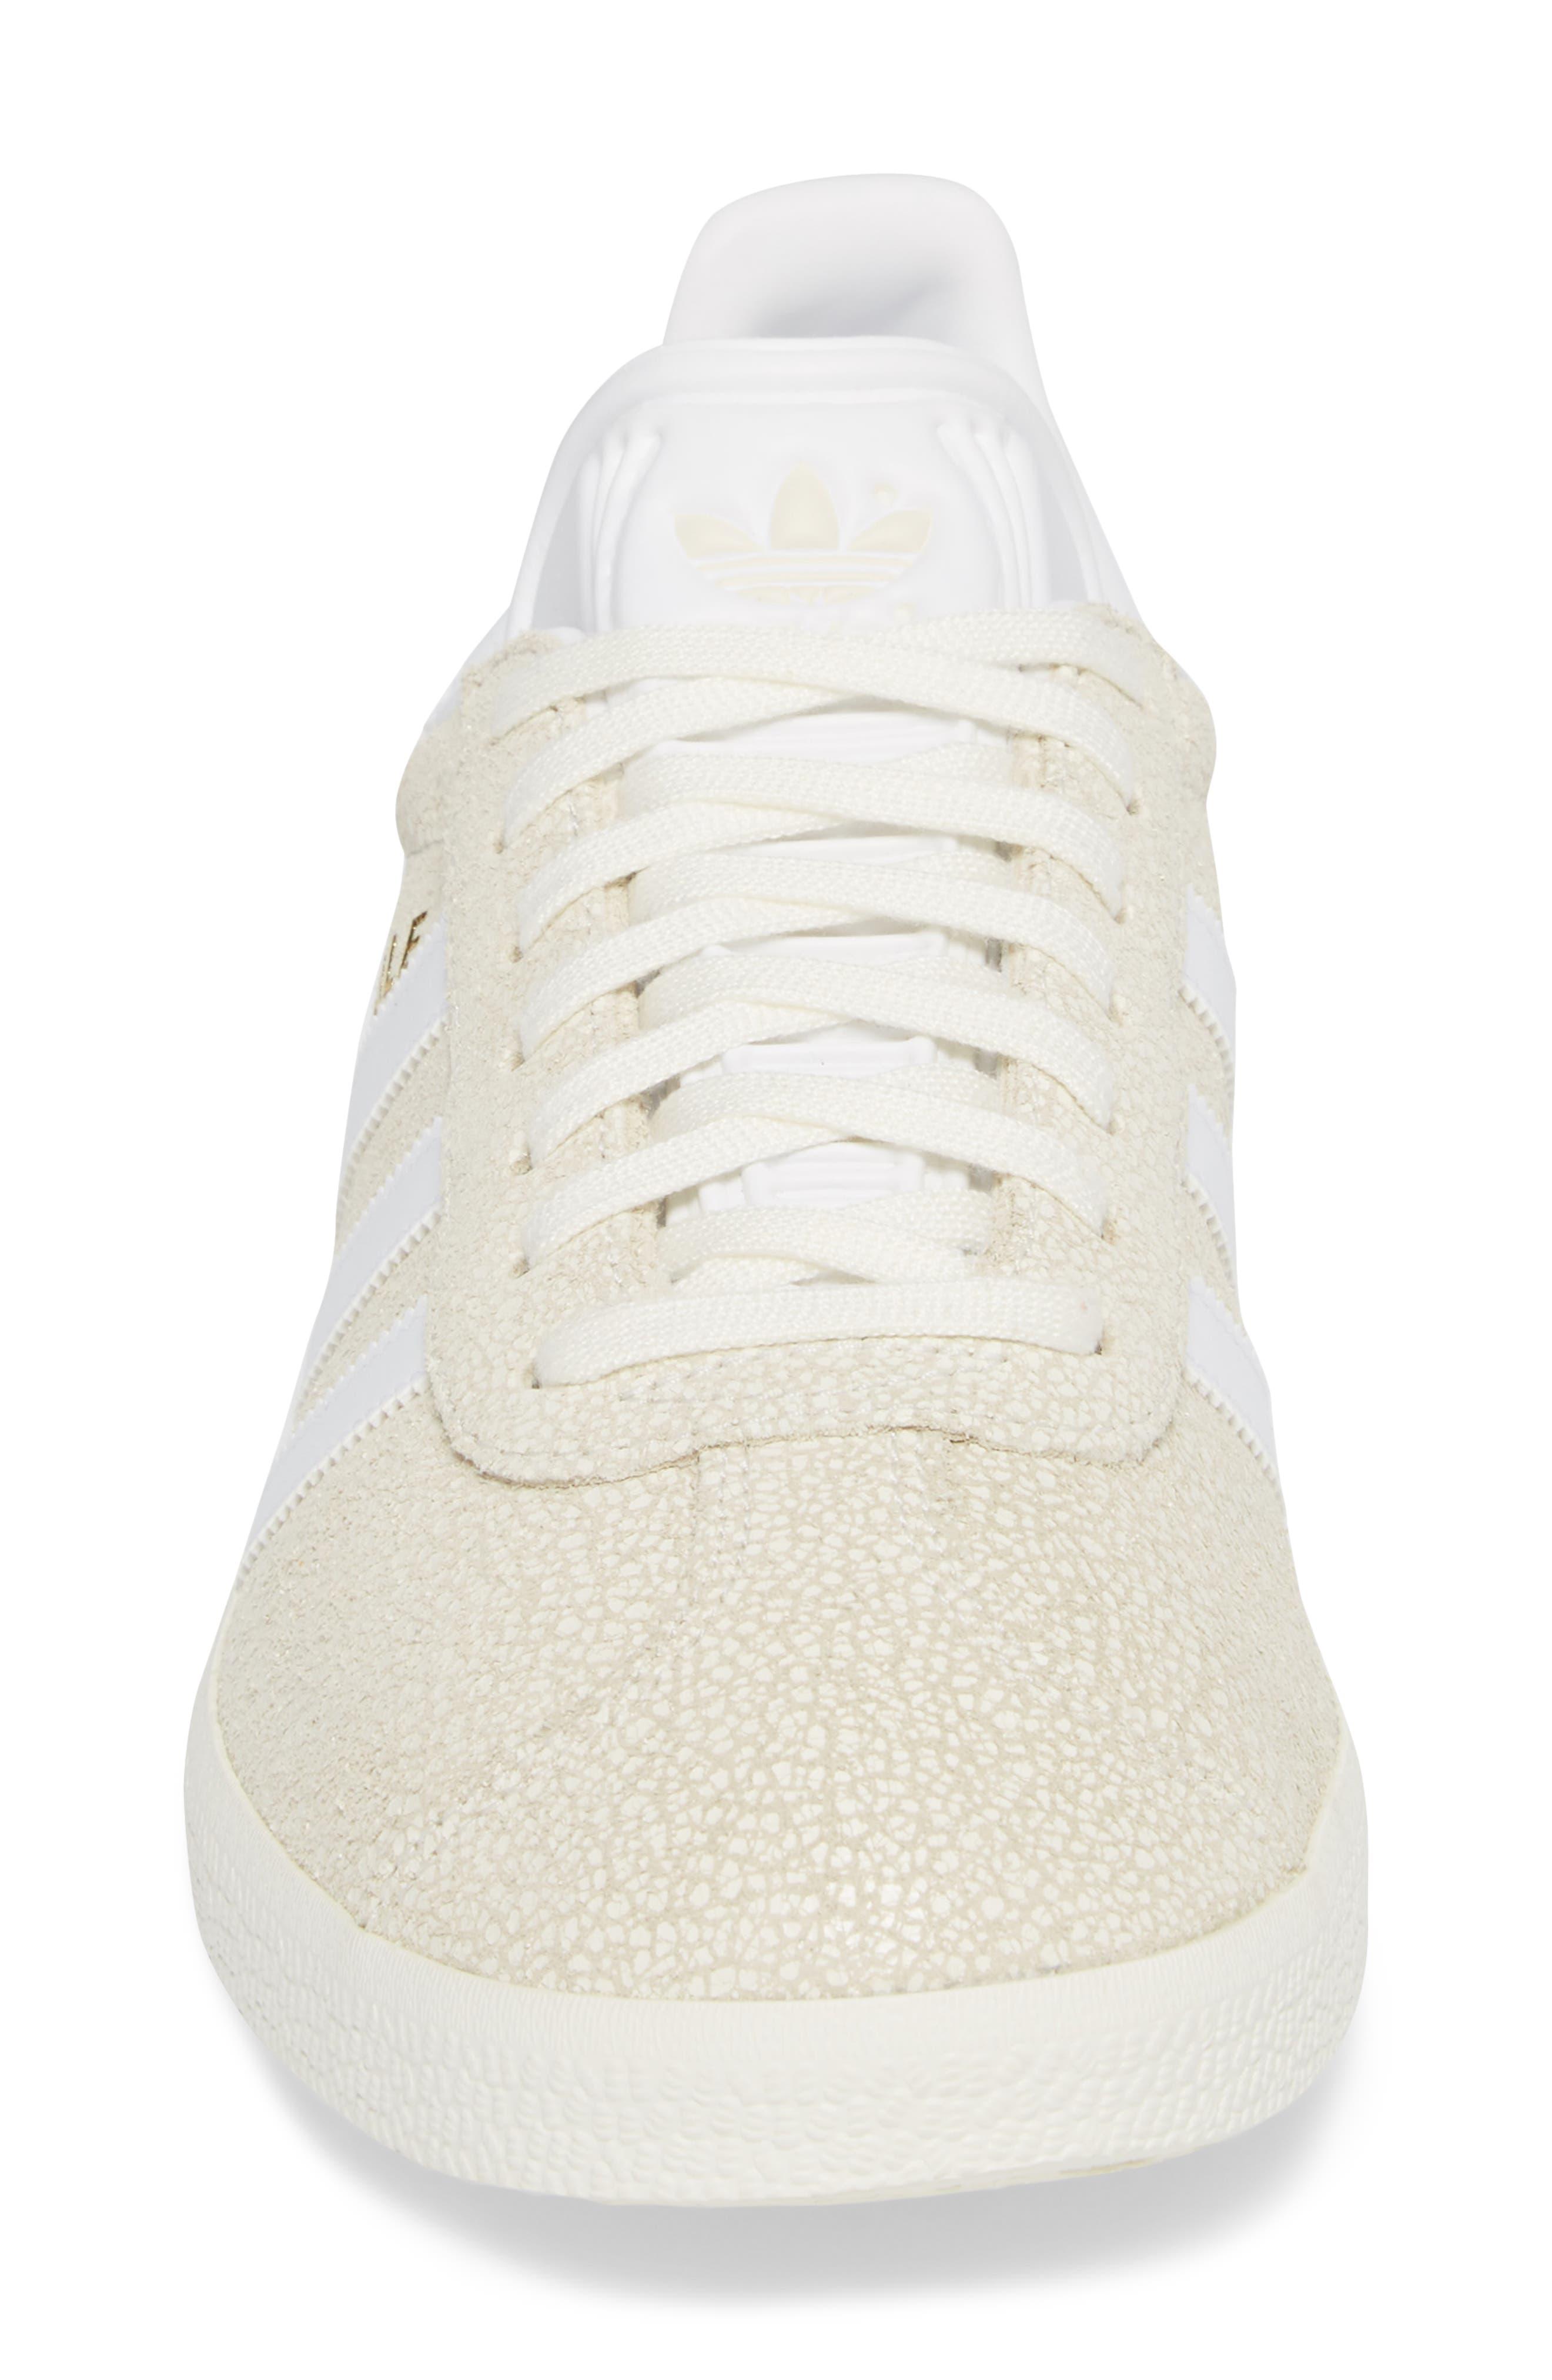 Gazelle Sneaker,                             Alternate thumbnail 4, color,                             OFF WHITE/ WHITE/ OFF WHITE